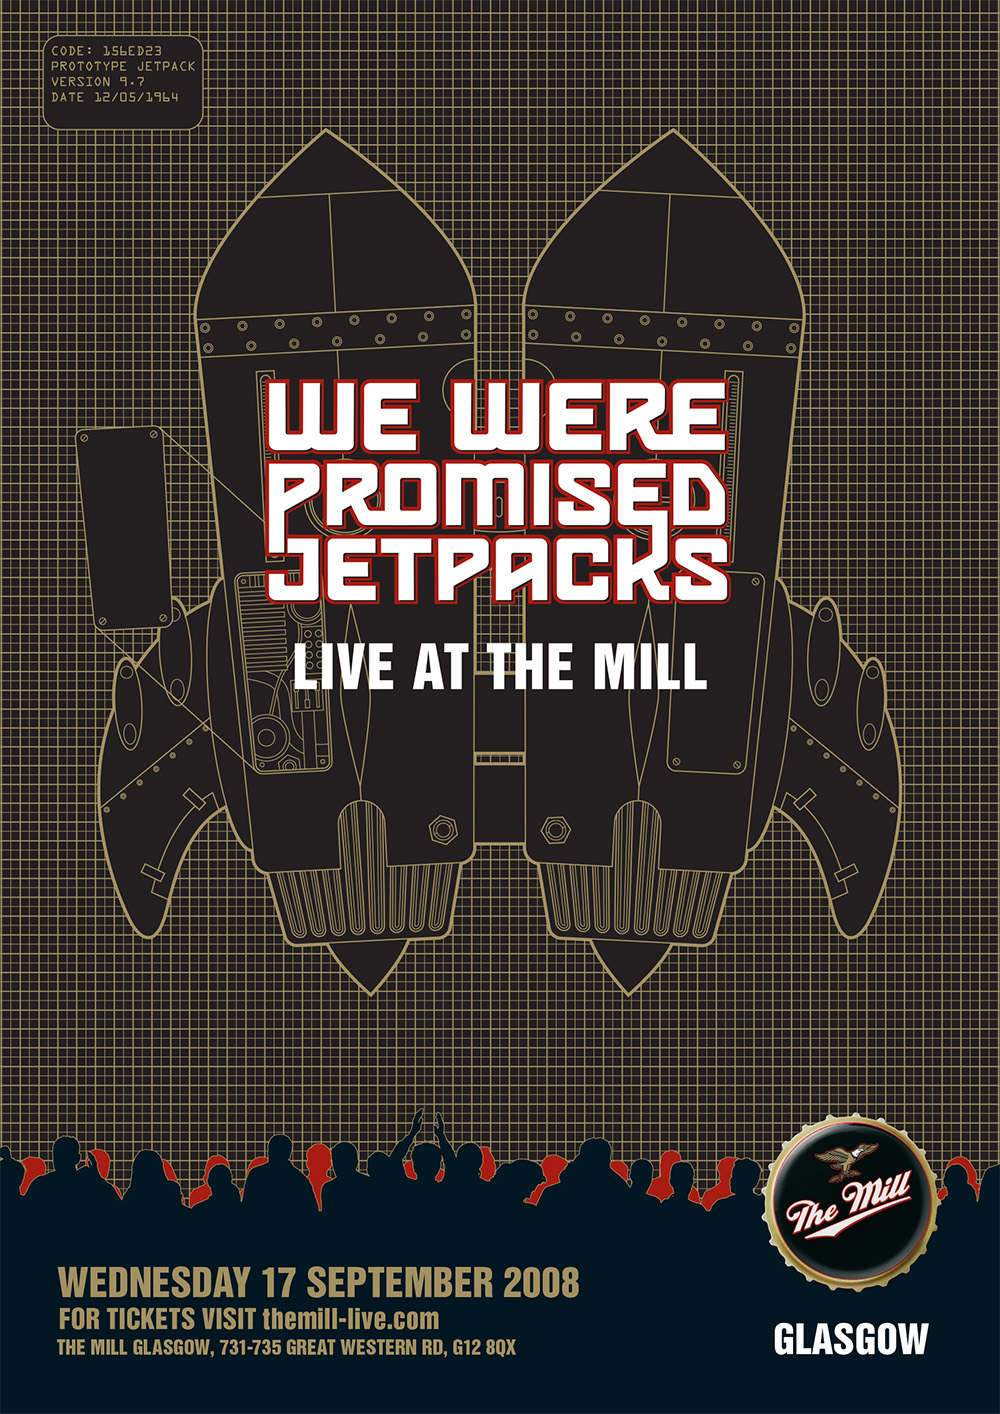 We were promised jetpacks v2 copy.jpg